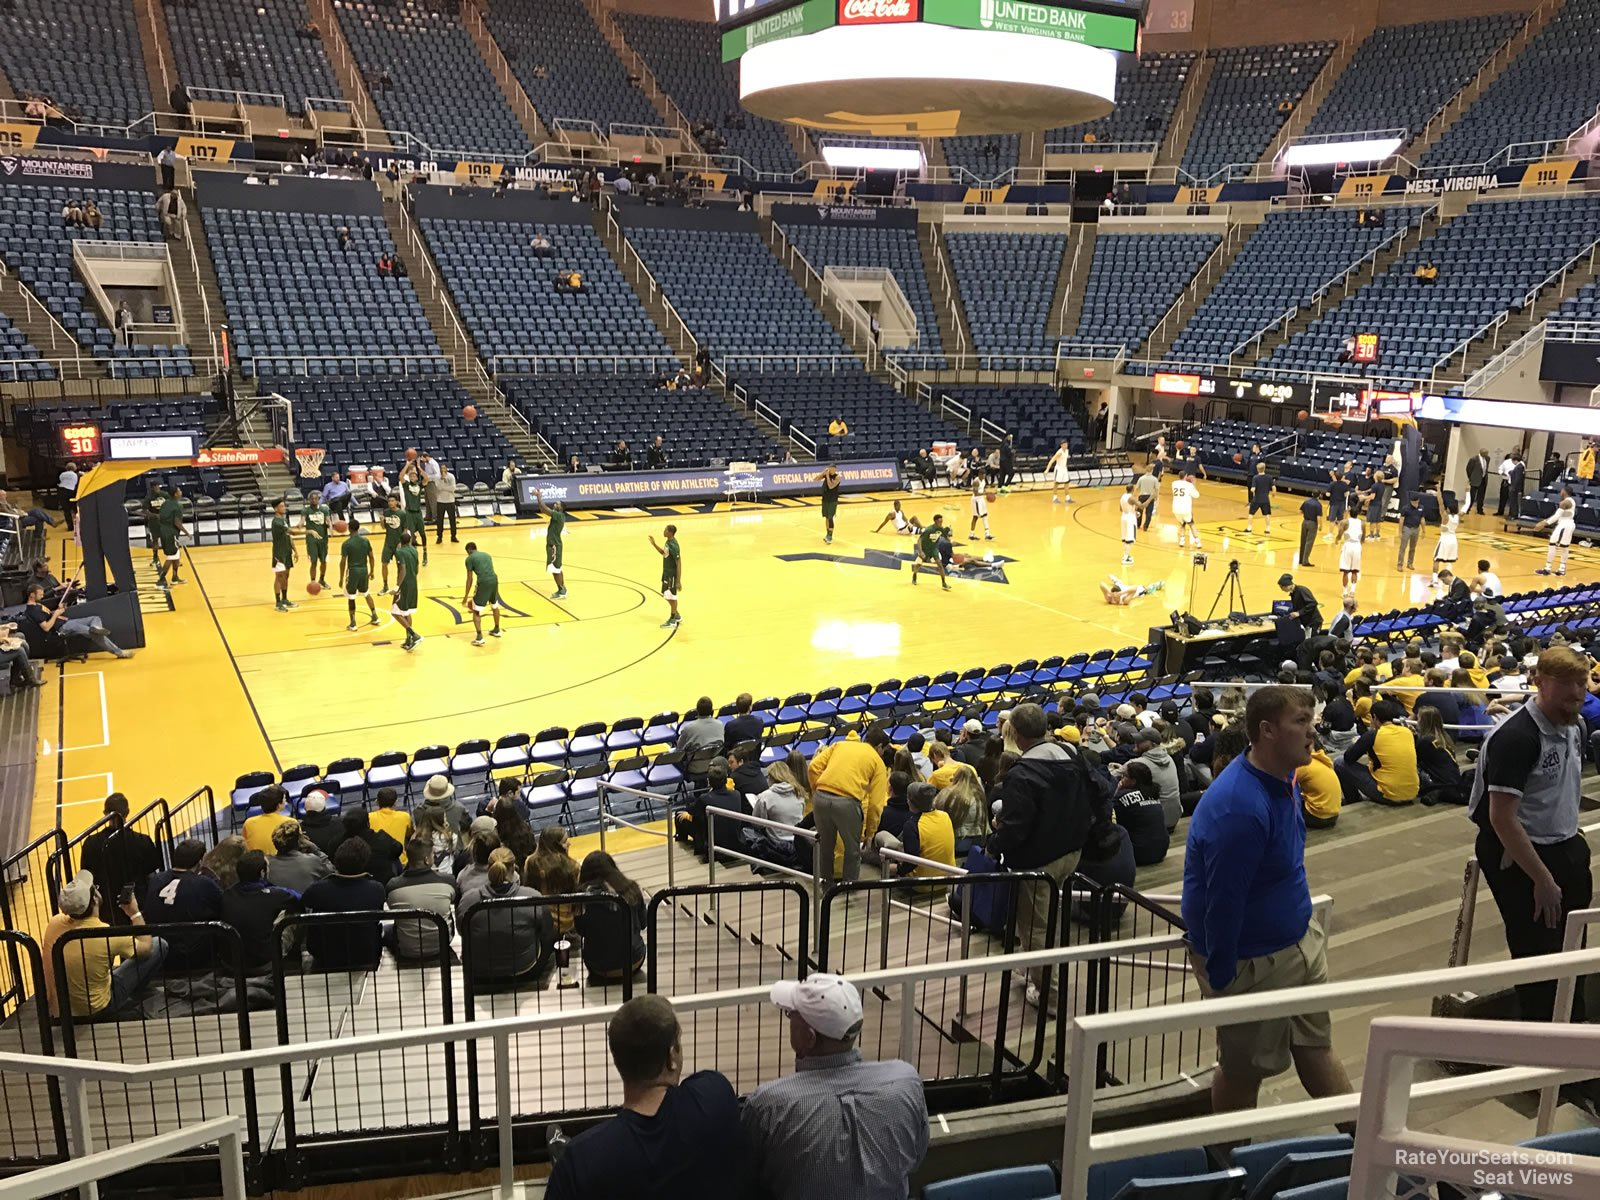 Wvu Coliseum Seating